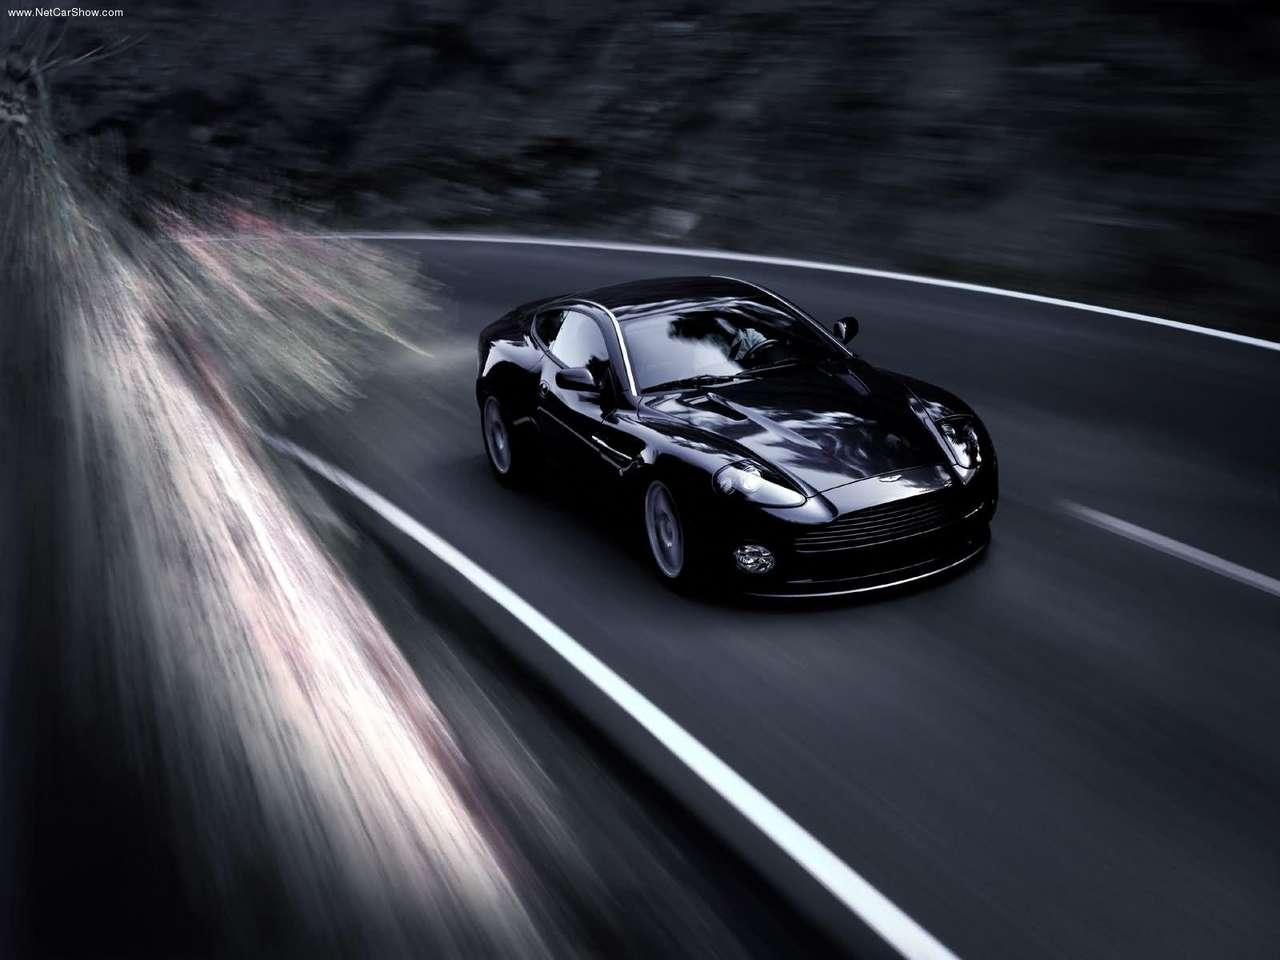 Aston Martin The Car Wallpaper Mania Wiki Fandom